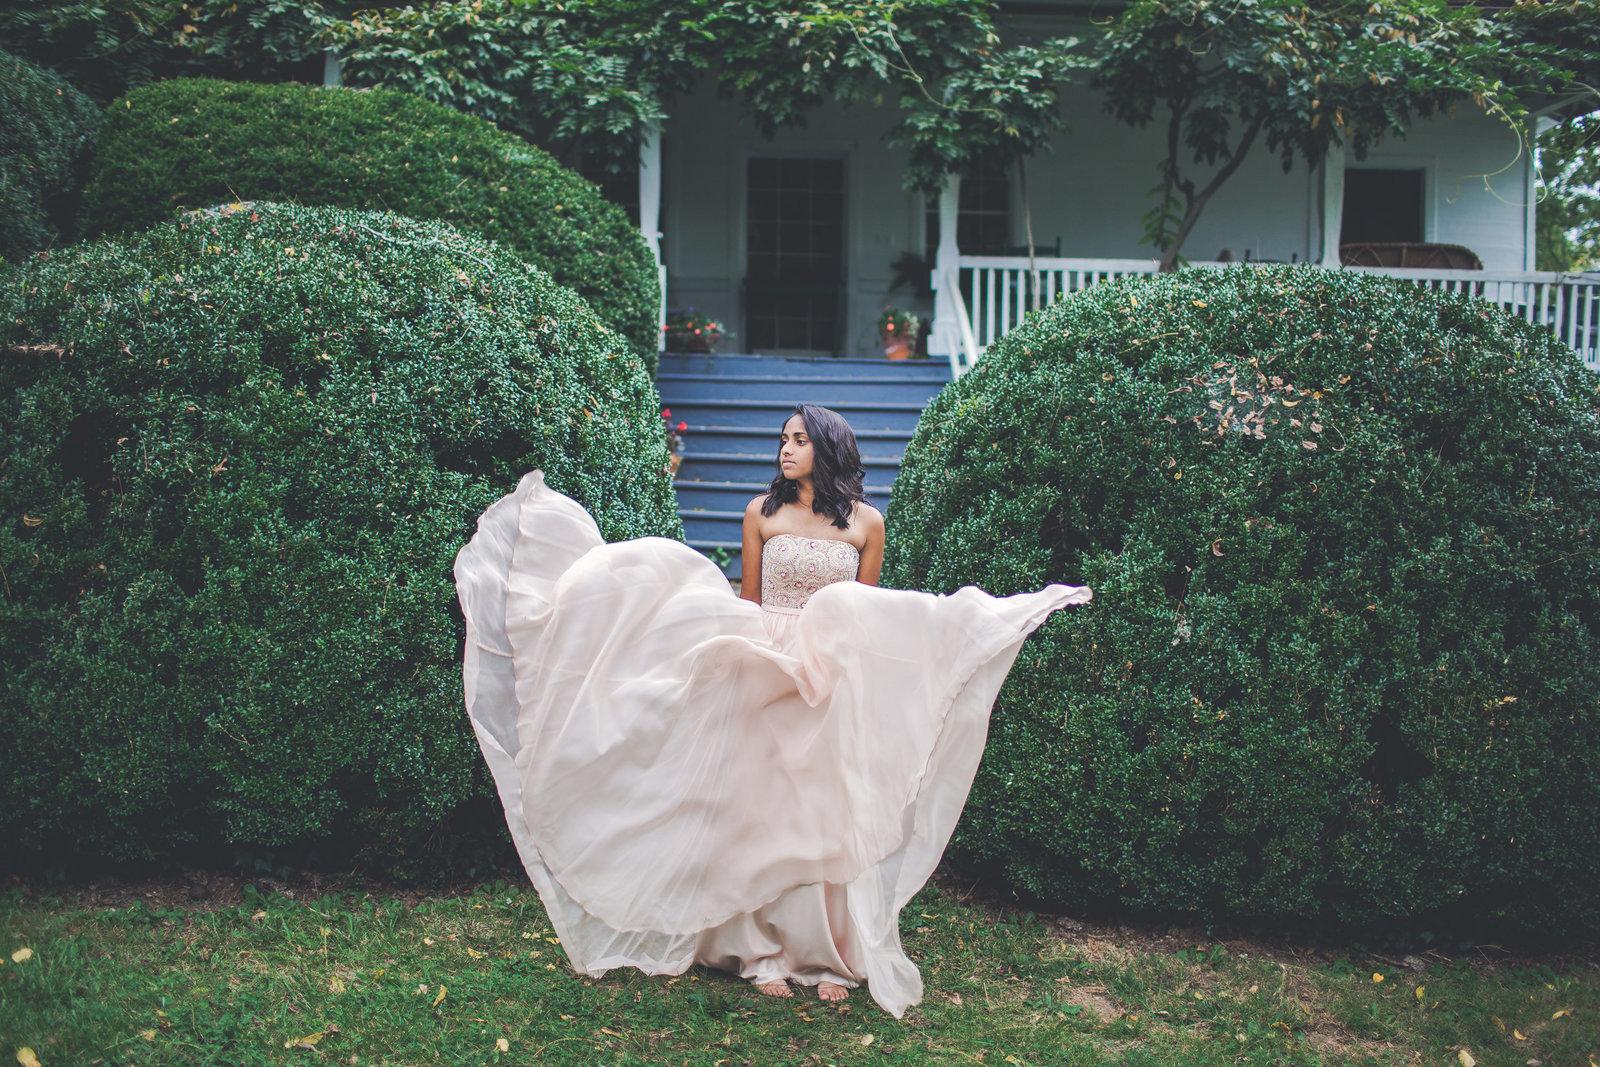 ashevilledestinationweddingphotographer_Biltmore_lifestyle_BrenPhotography_385